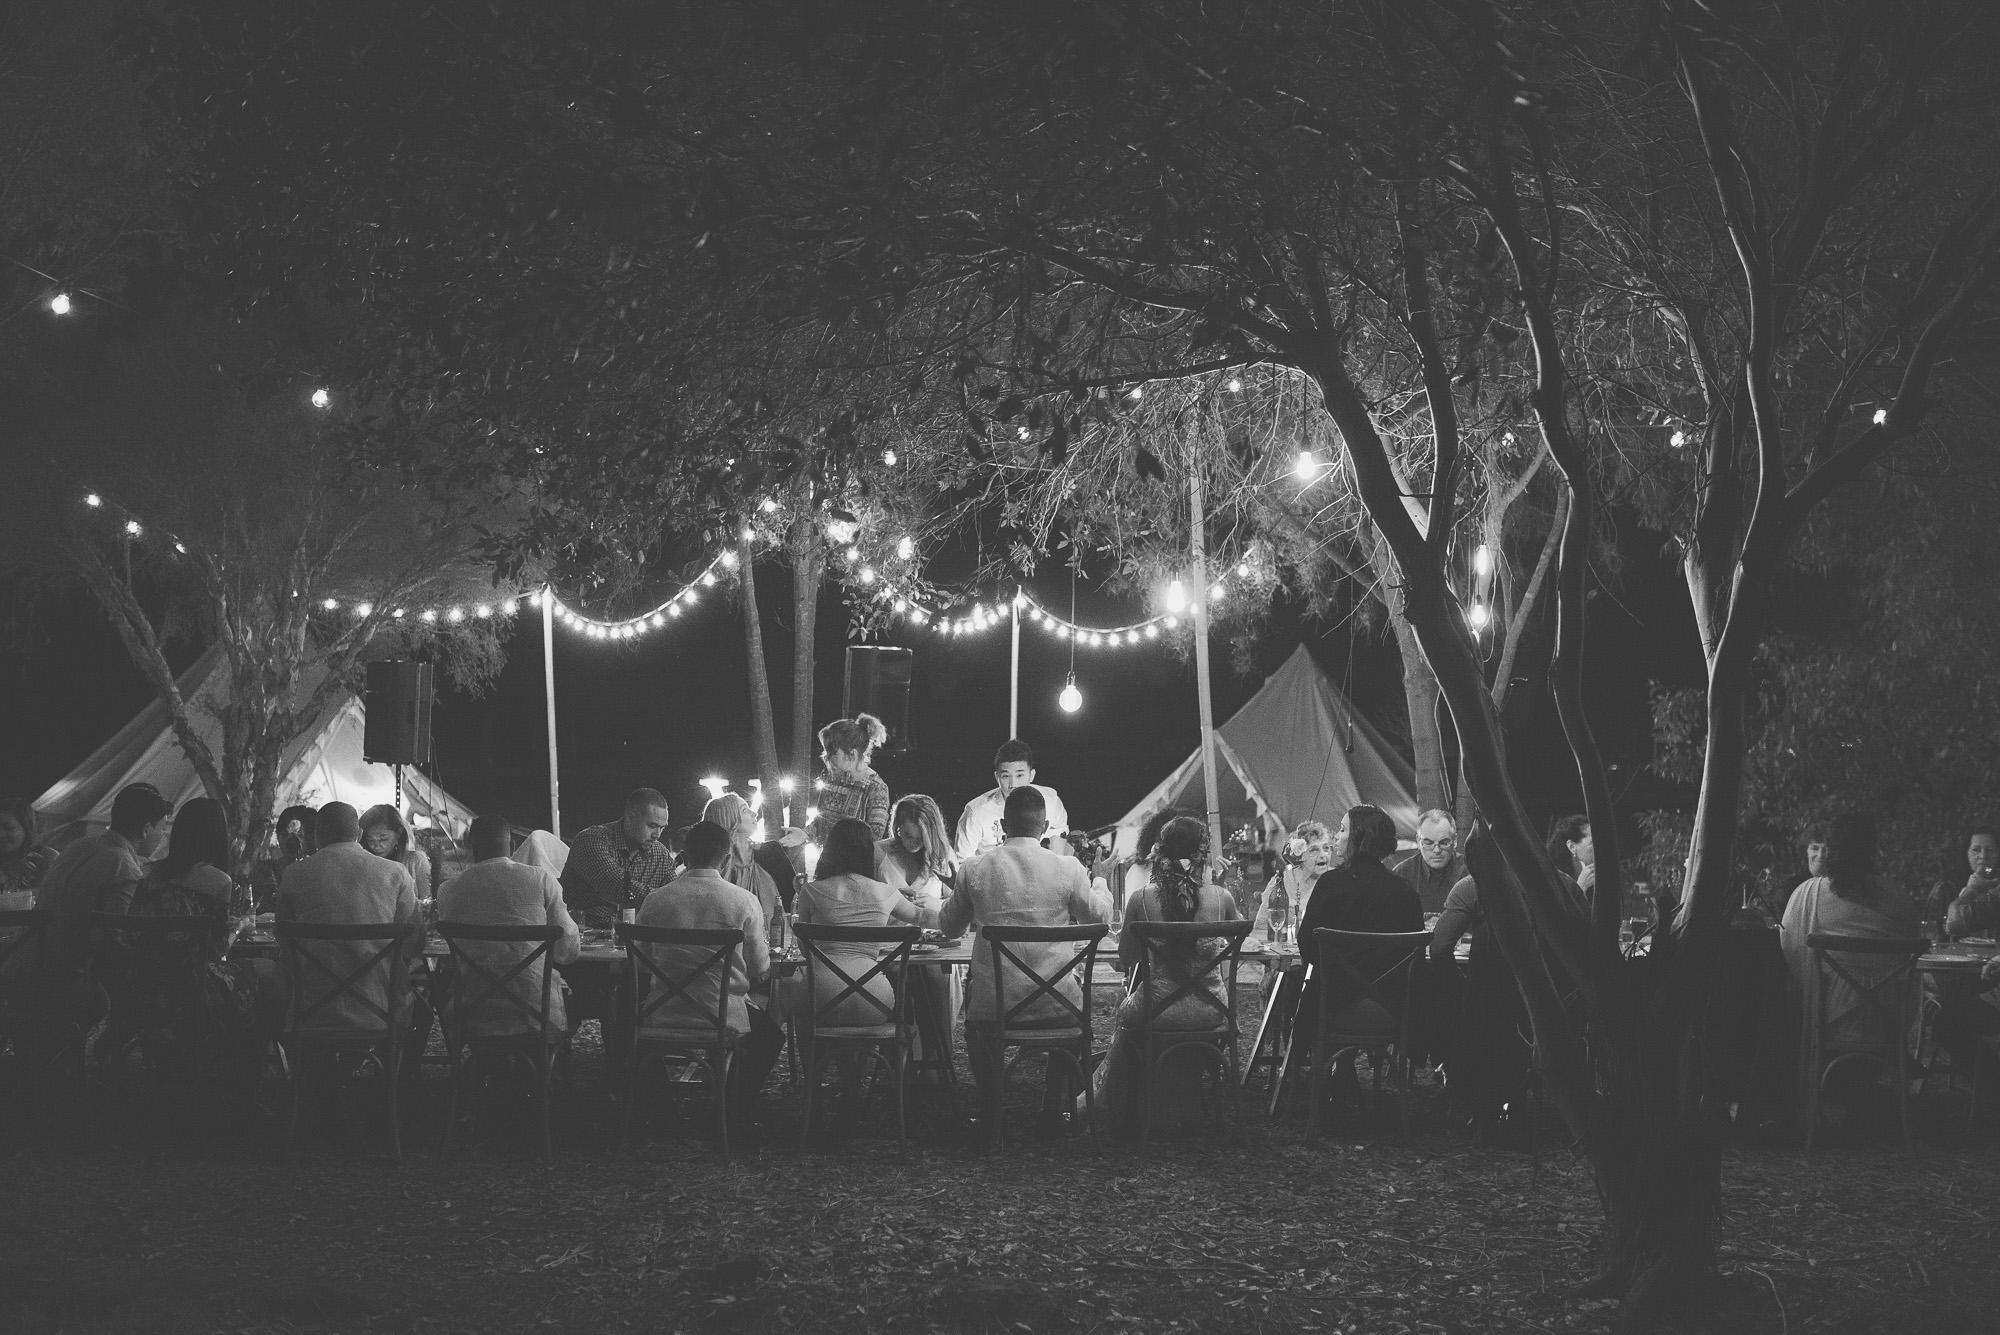 wedding-photographer-outdoor-casual-styled-los-angeles-australia-california-international-earthbound -91.jpg